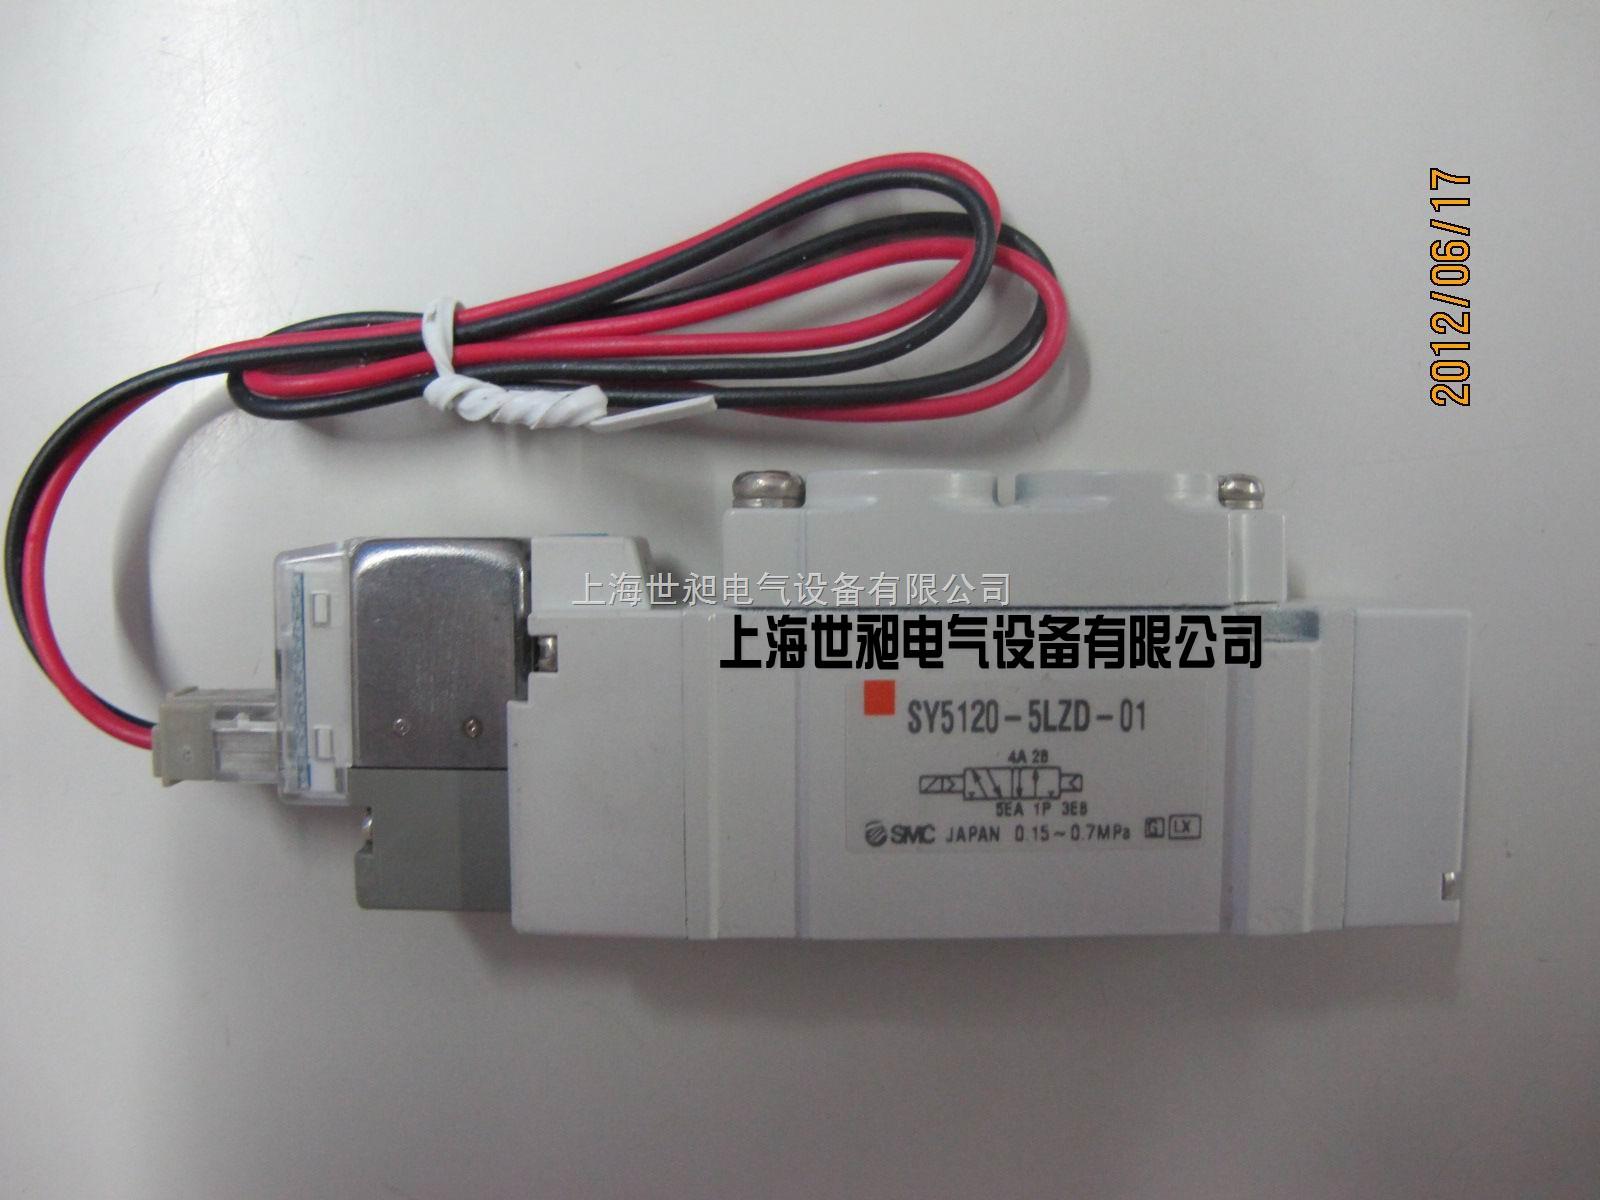 smc电磁阀 sy5120-5lzd-01图片